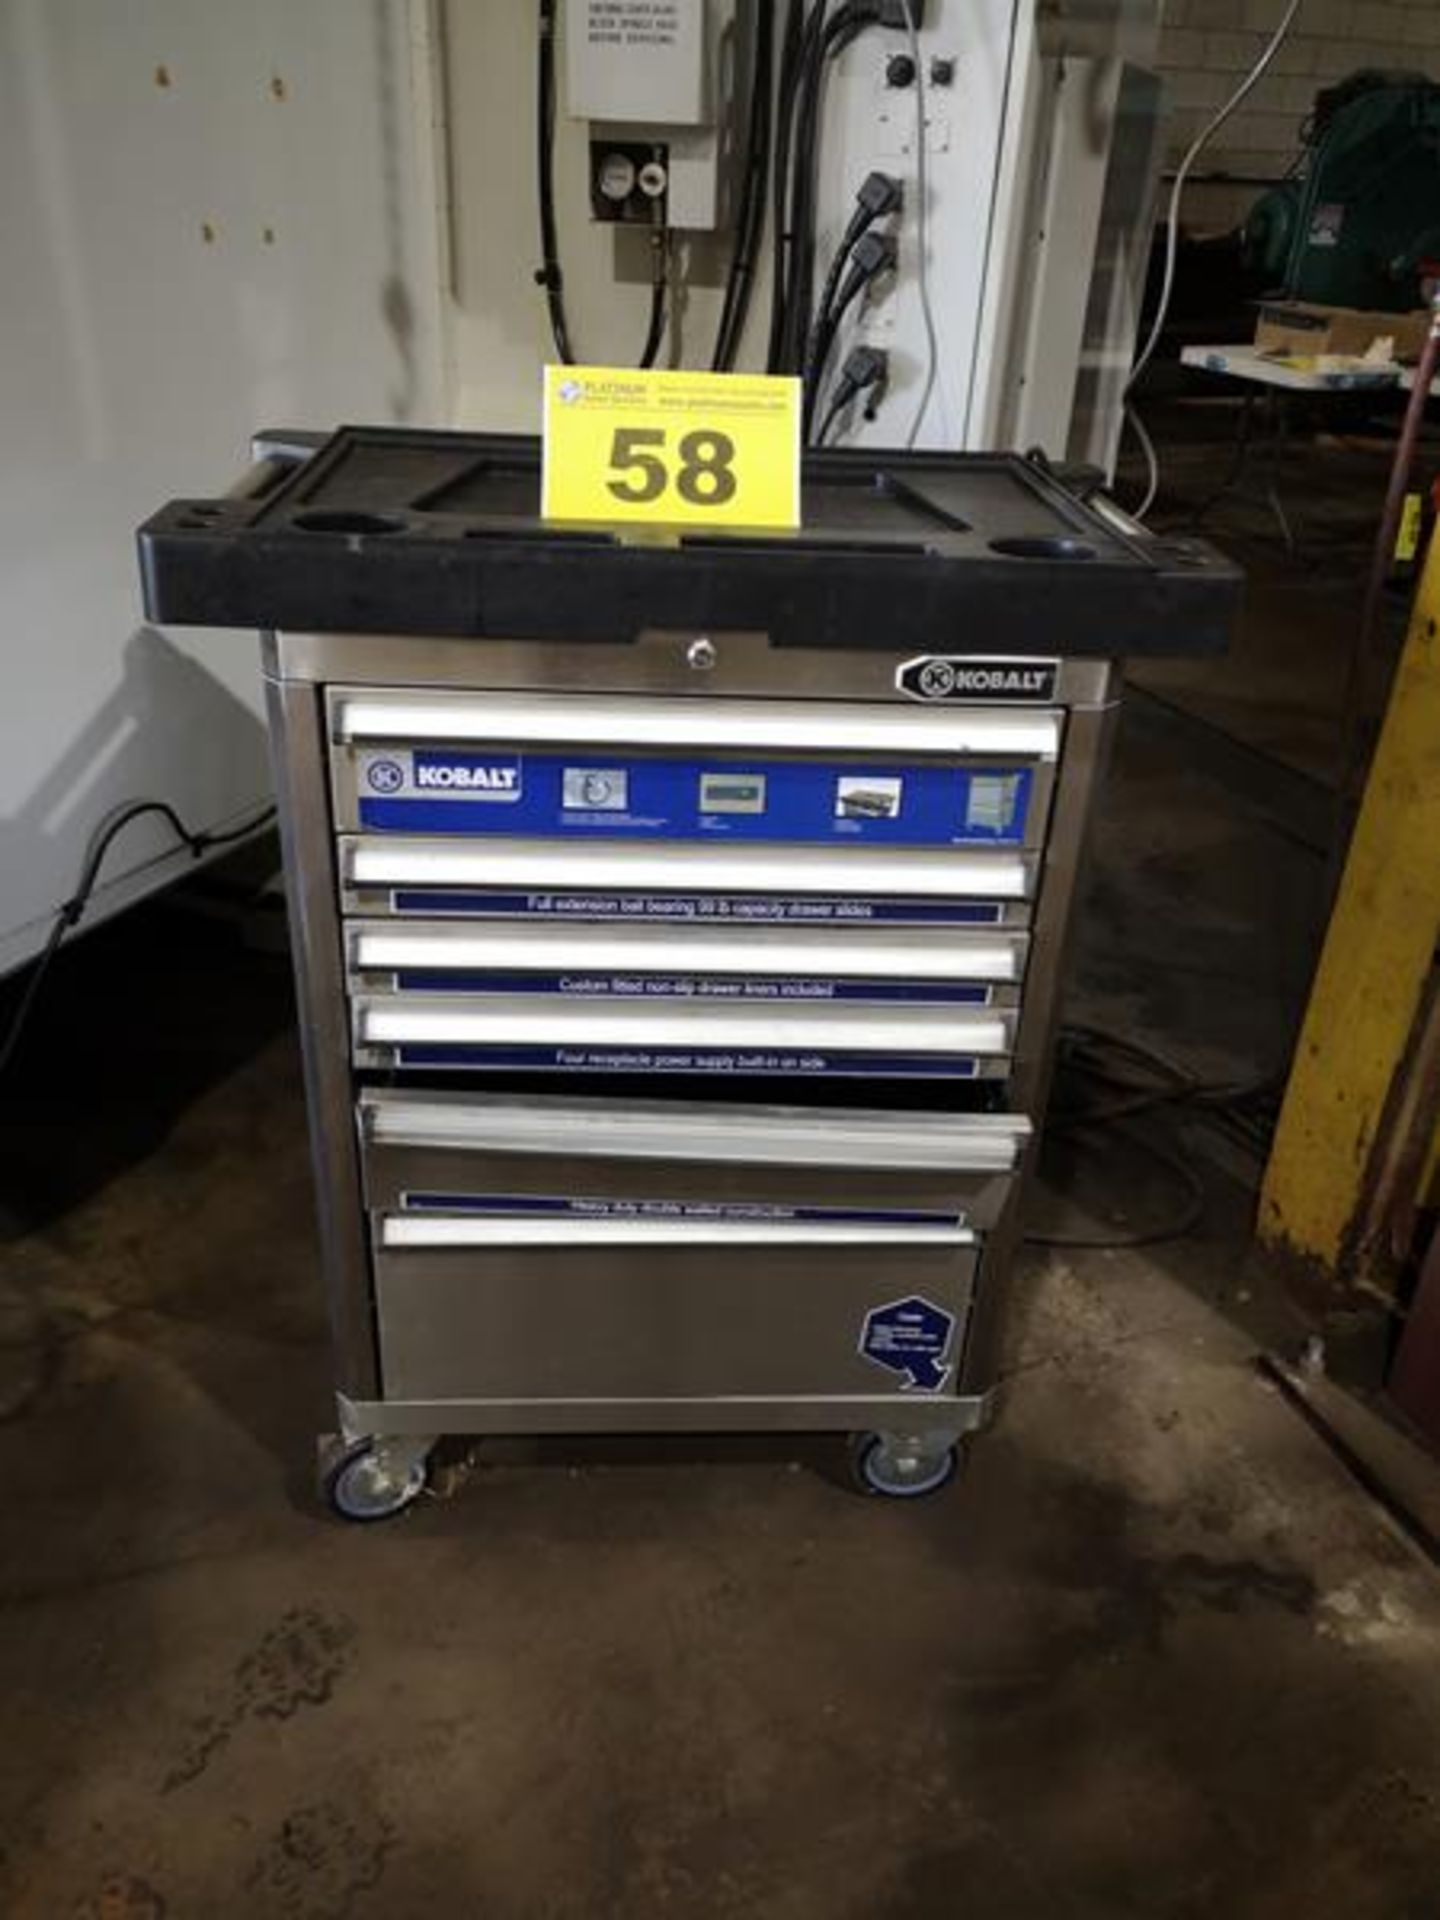 KOBALT, 6 DRAWER TOOL CABINET ON CASTERS( 1 DRAWER REQUIRES REPAIR)